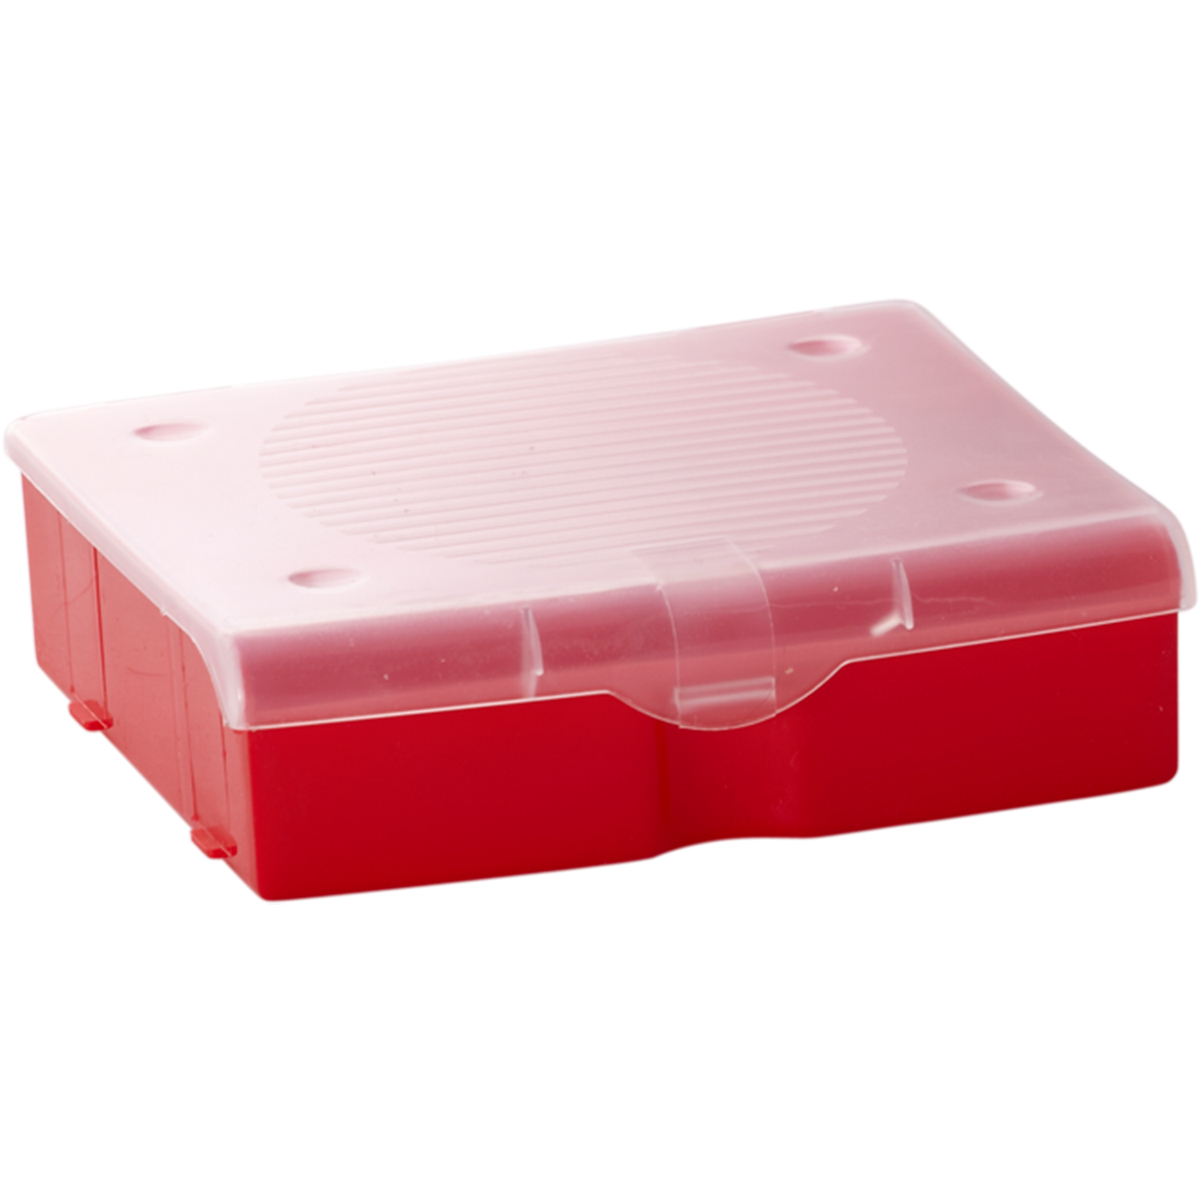 Органайзер для мелочей Blocker, цвет: красный, 17 х 16 х 4,5 см цена